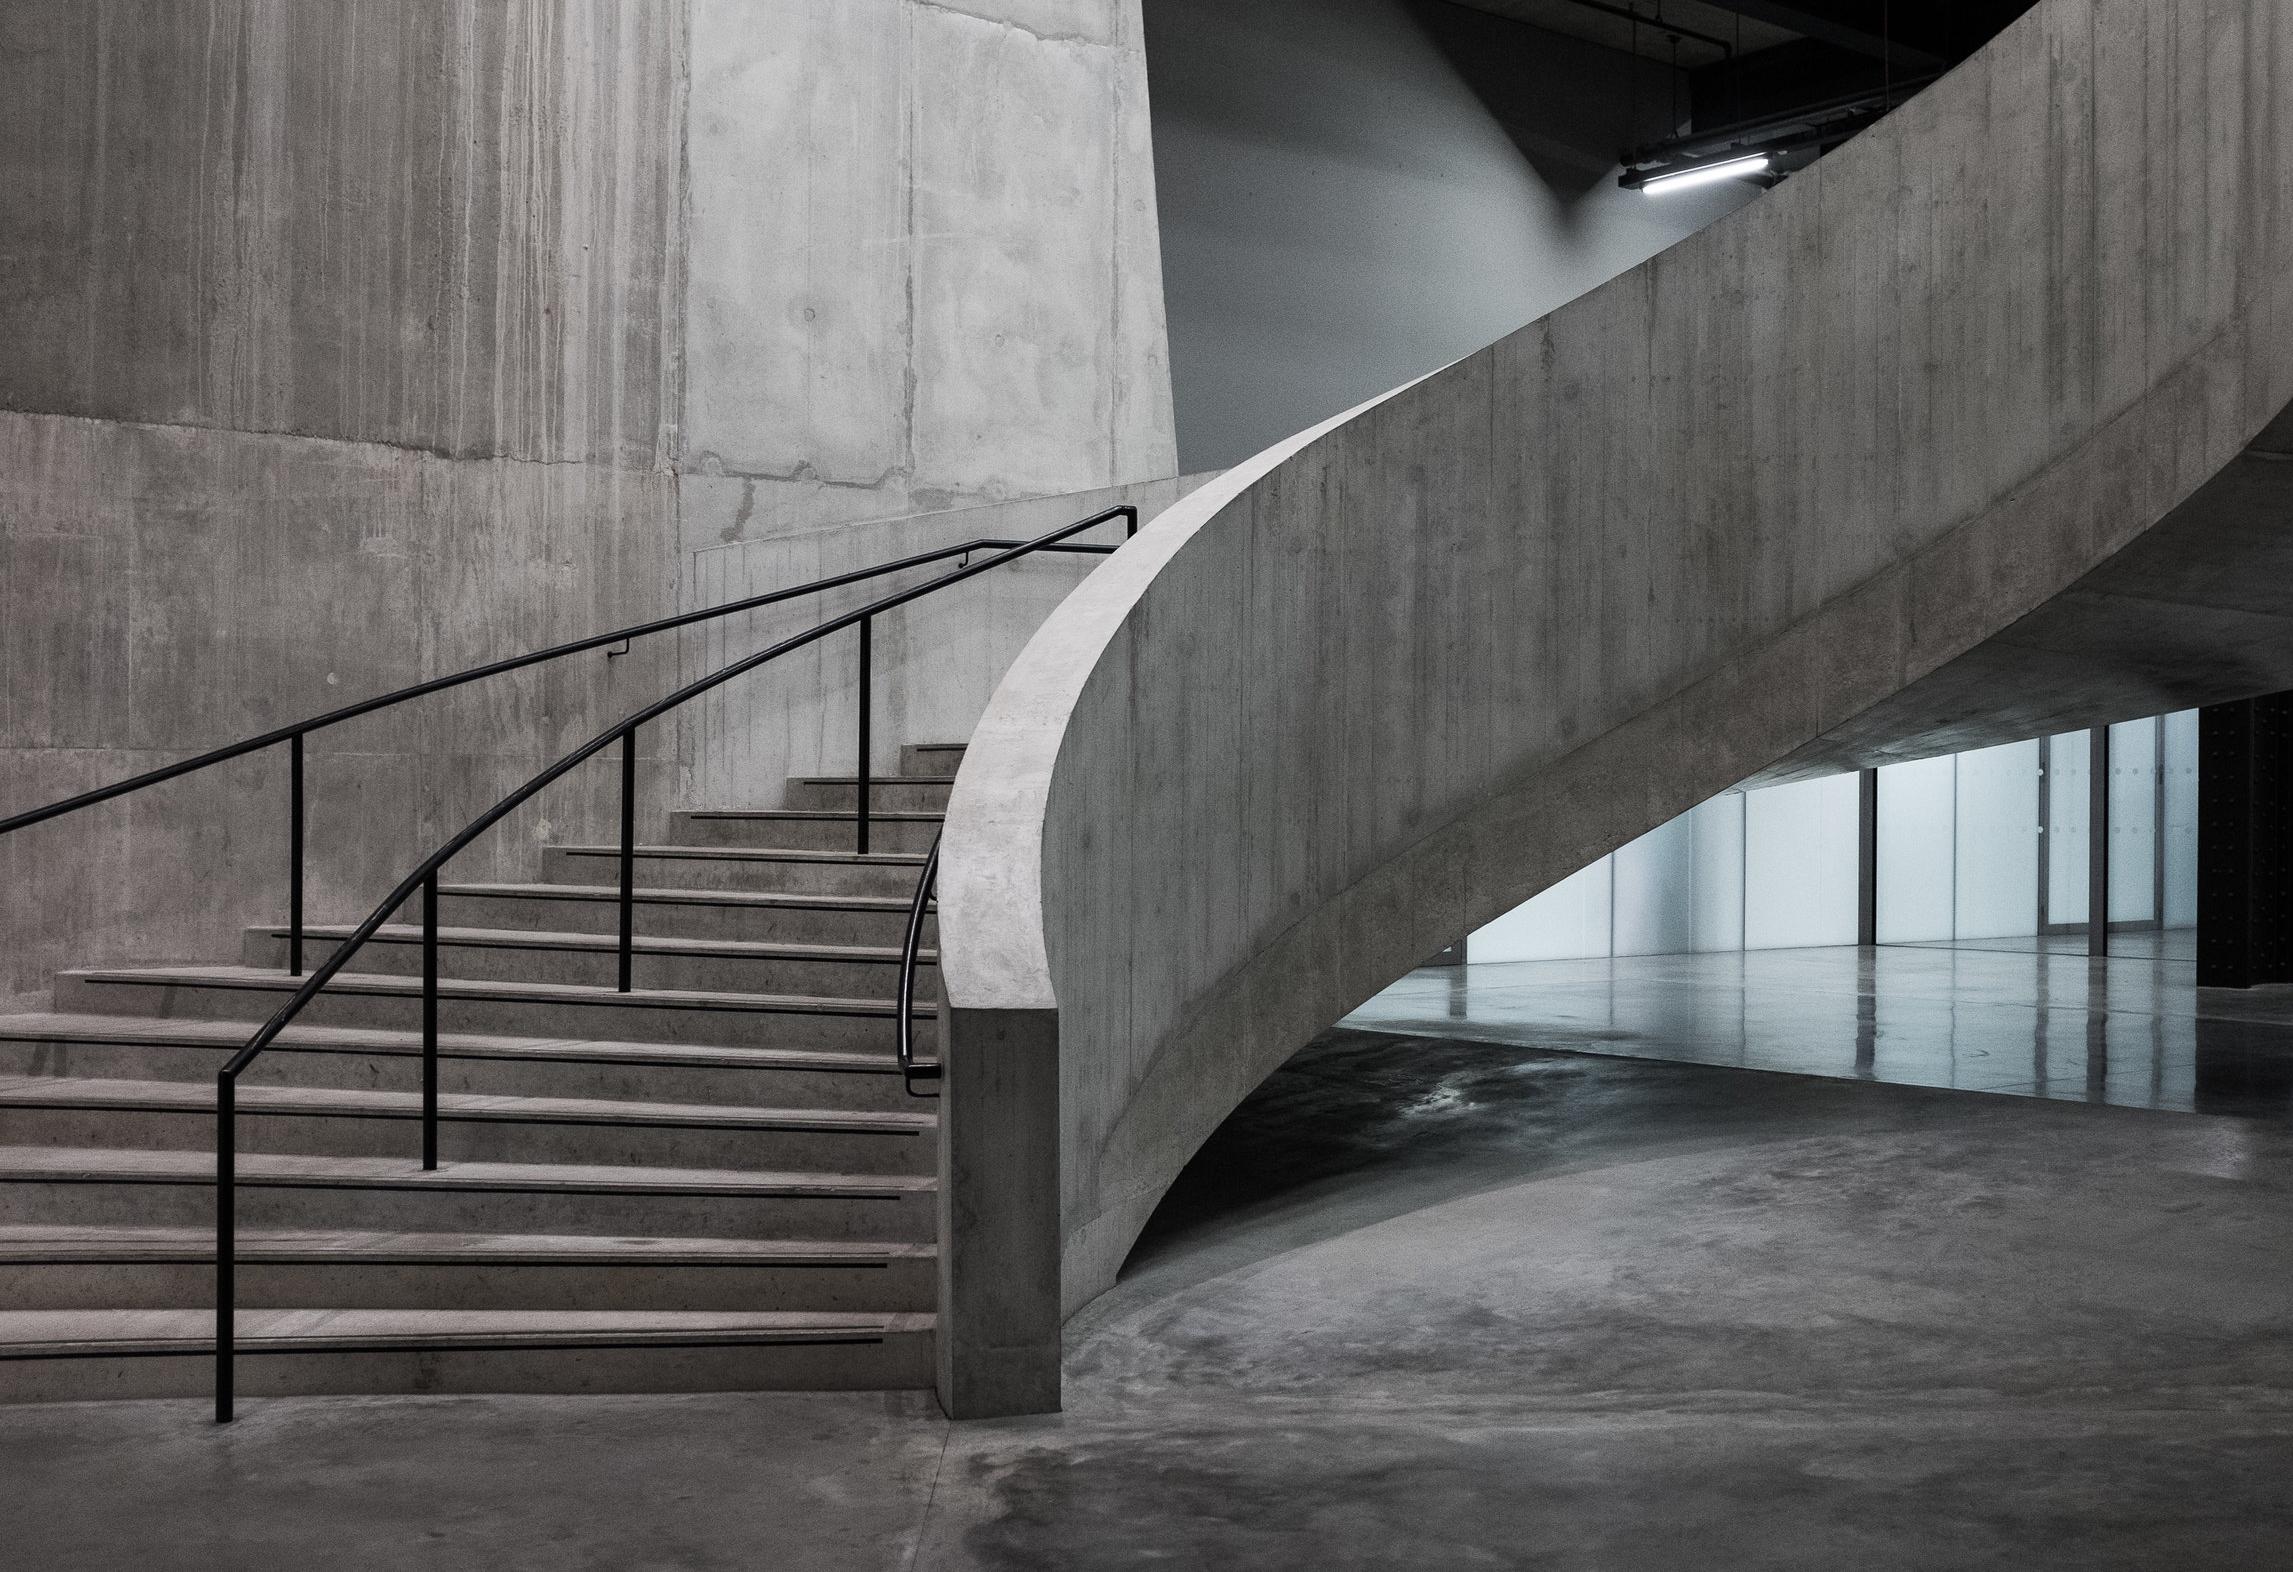 Tate+Modern+by+handover-3-1.jpg